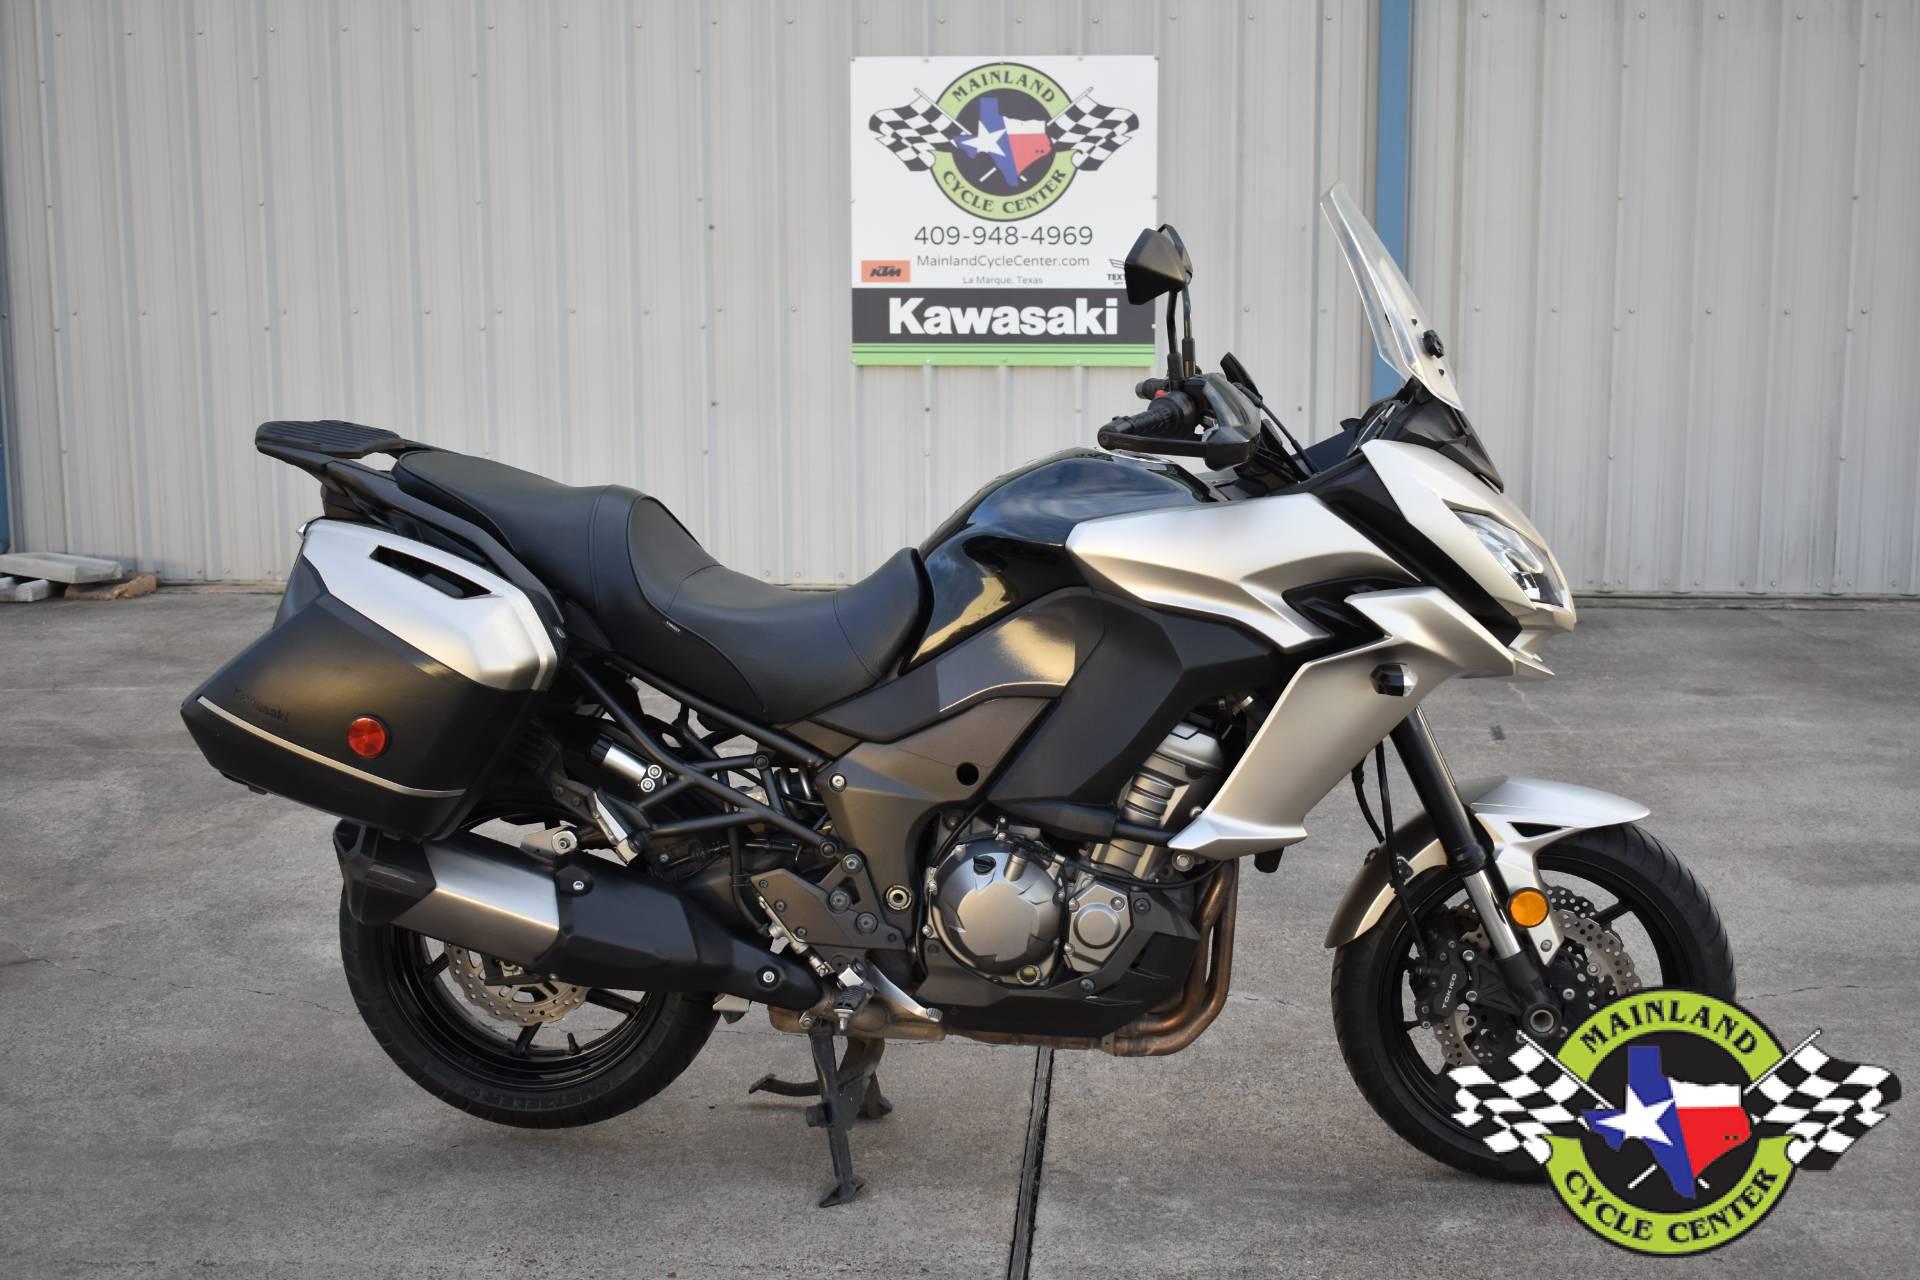 [motorcycle.com] - 2015 Kawasaki Versys 1000 LT First Ride